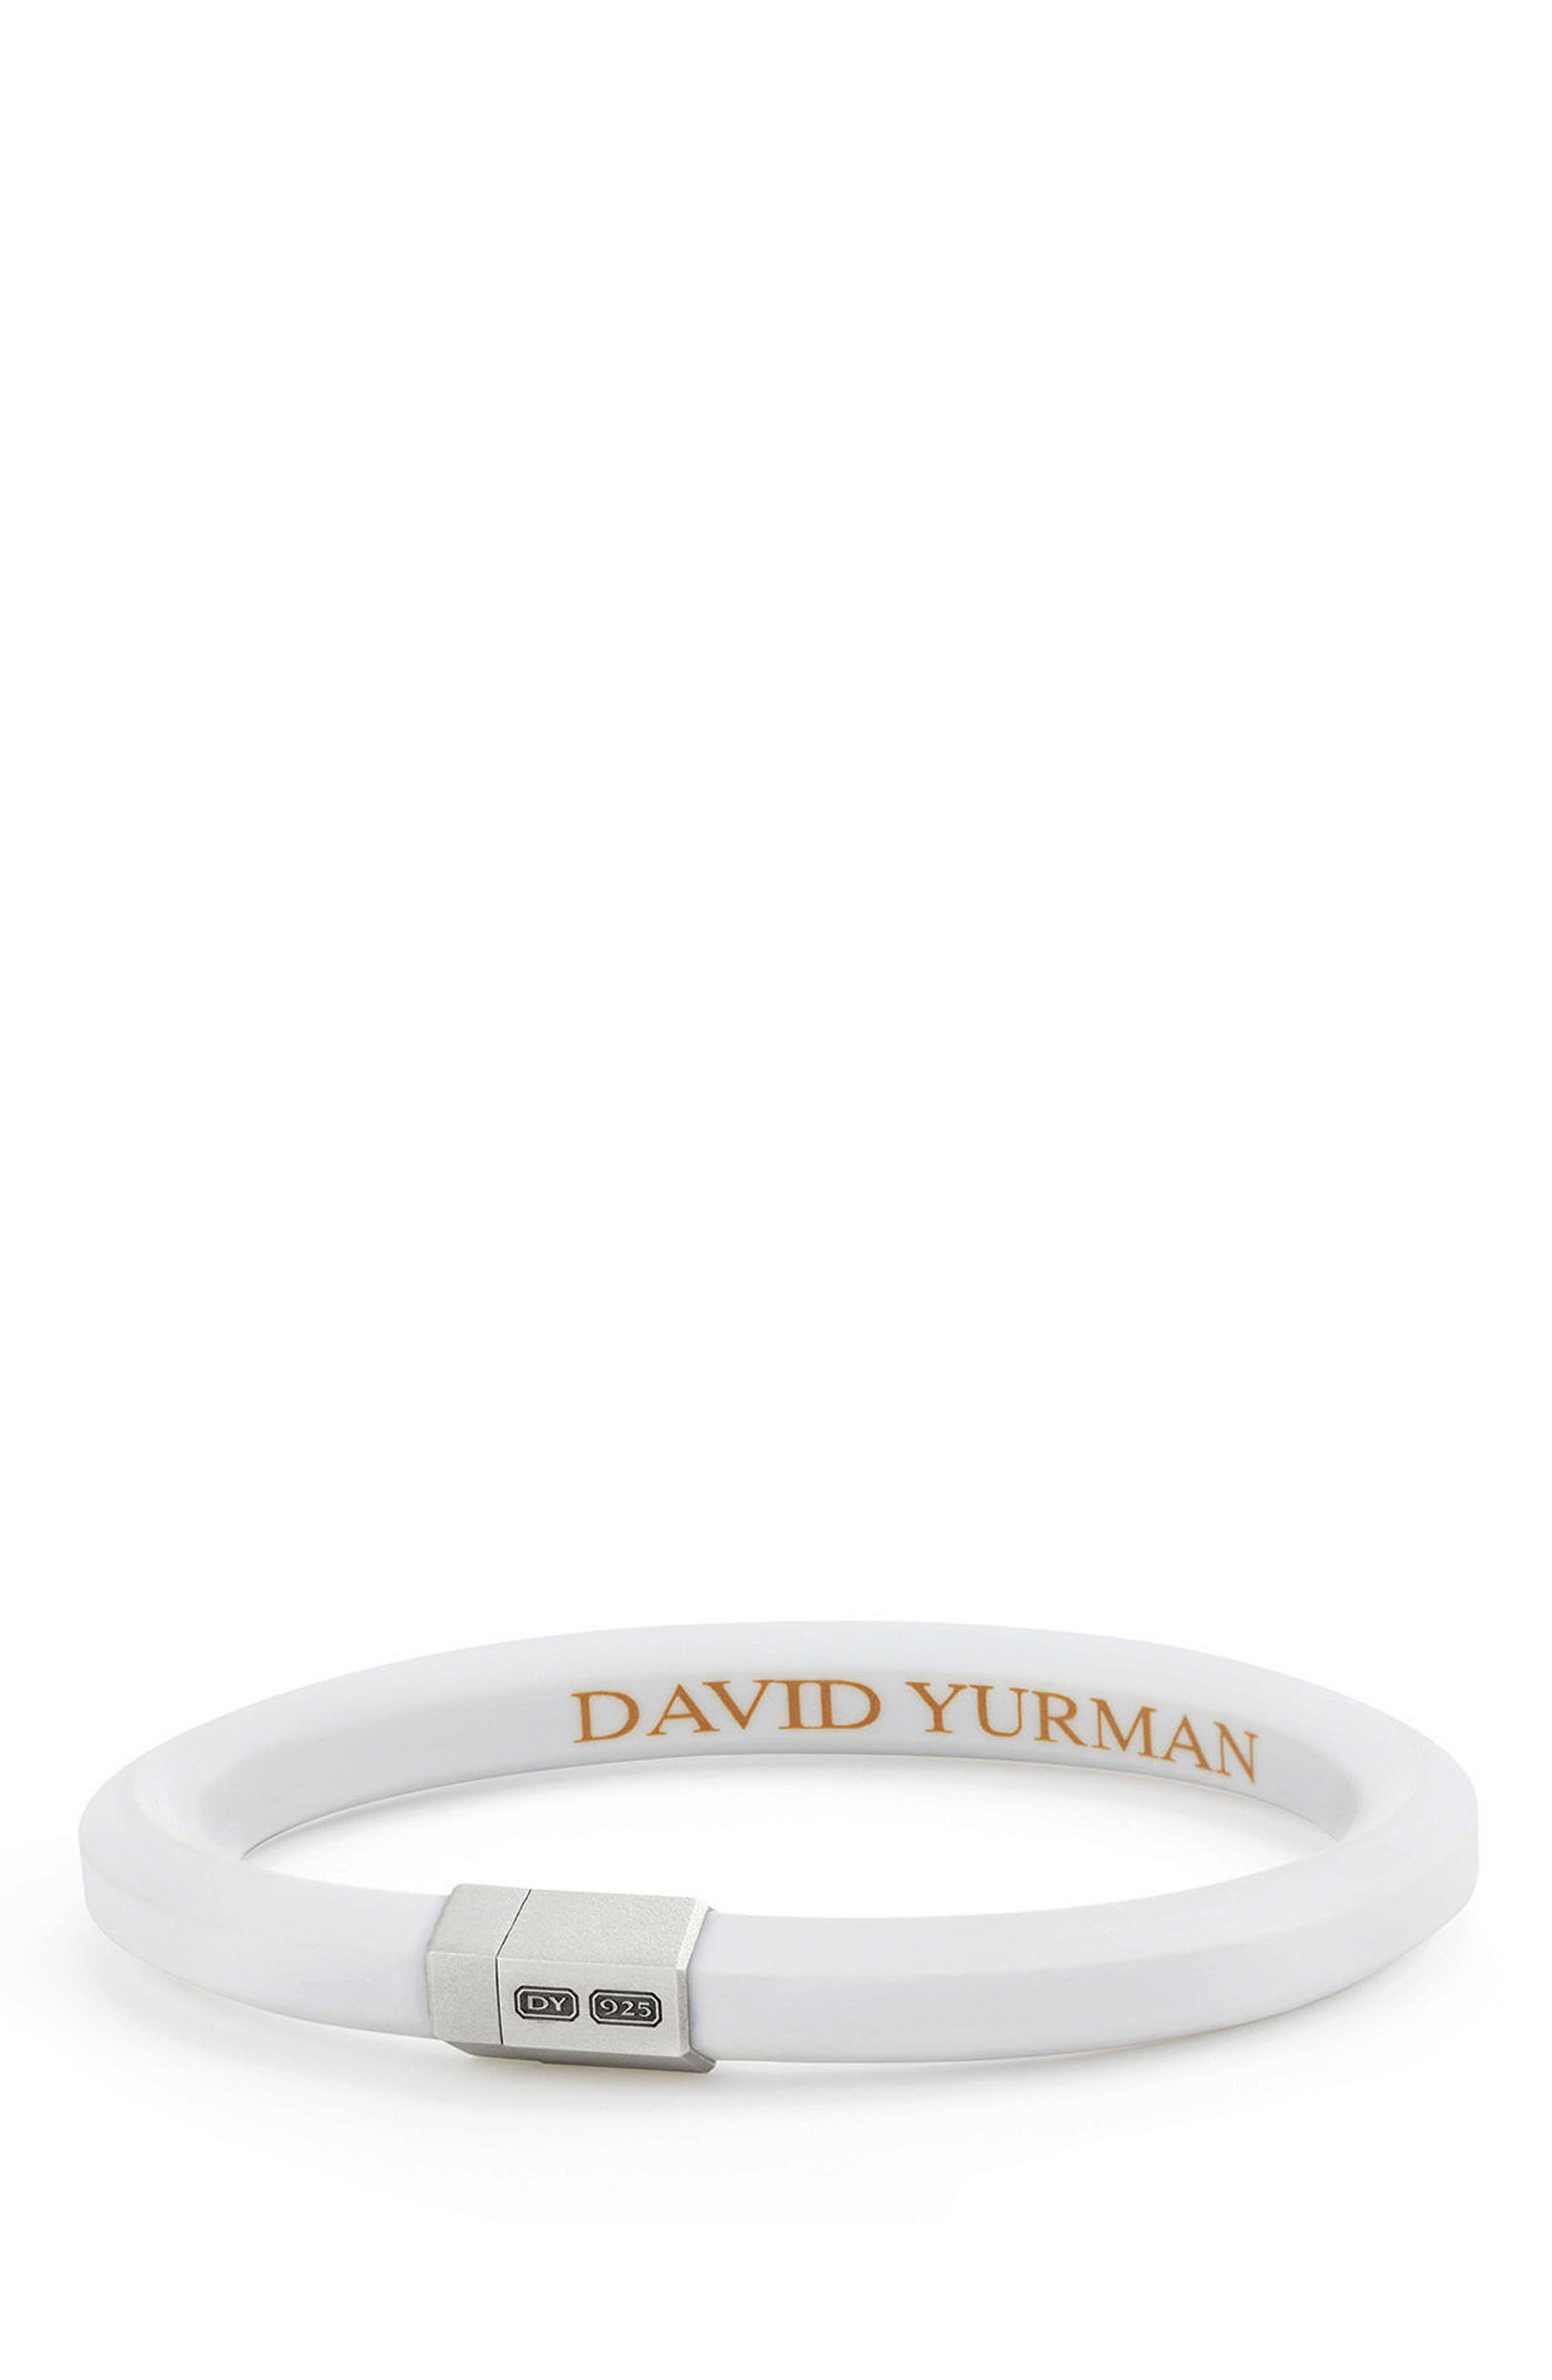 Main Image - David Yurman 10.5mm Hex Bracelet